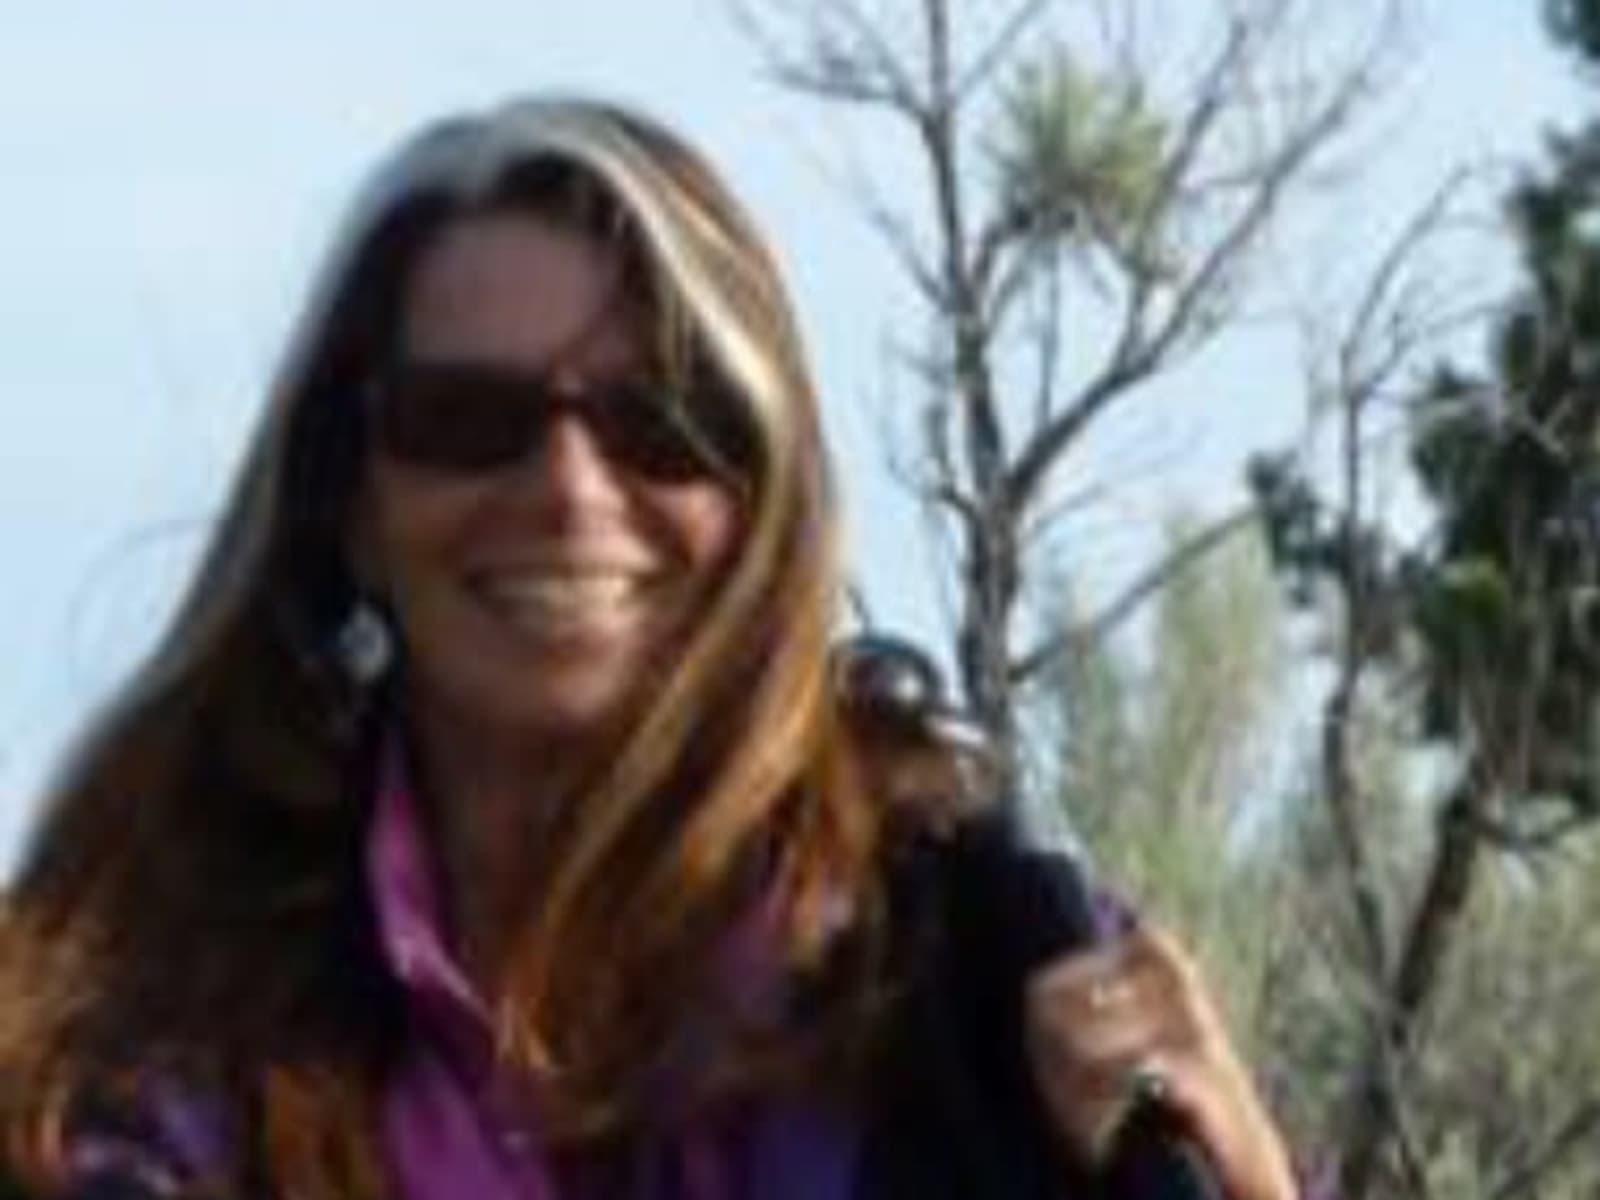 Alicia from Mattapoisett, Massachusetts, United States